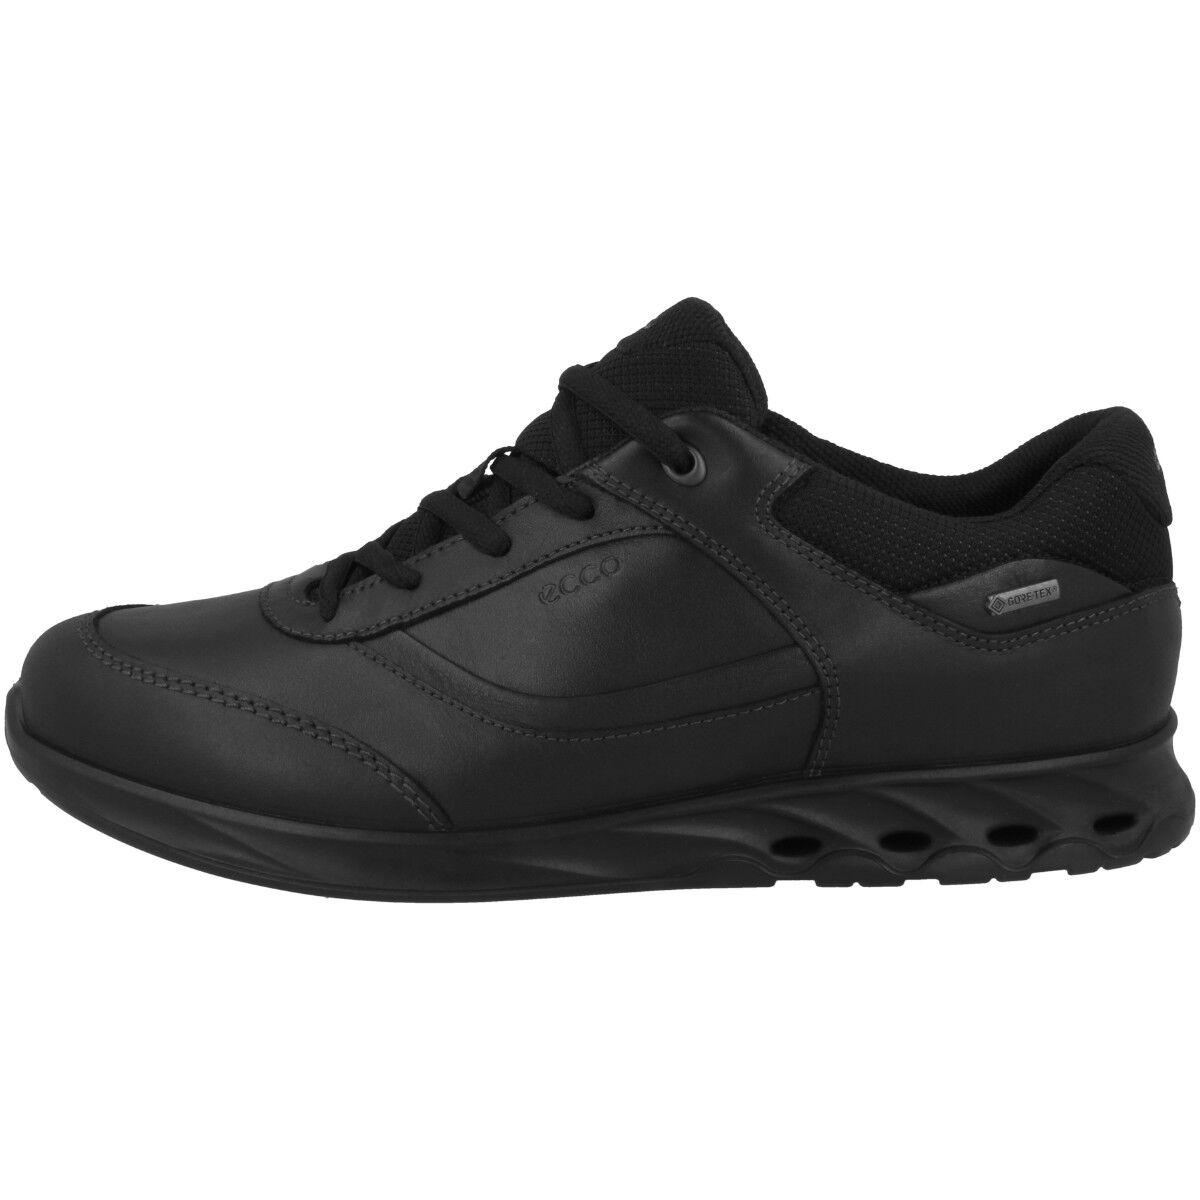 Ecco wayfly Rigger GTX mujer trekking señora outdoor zapatos negro 835203-53859